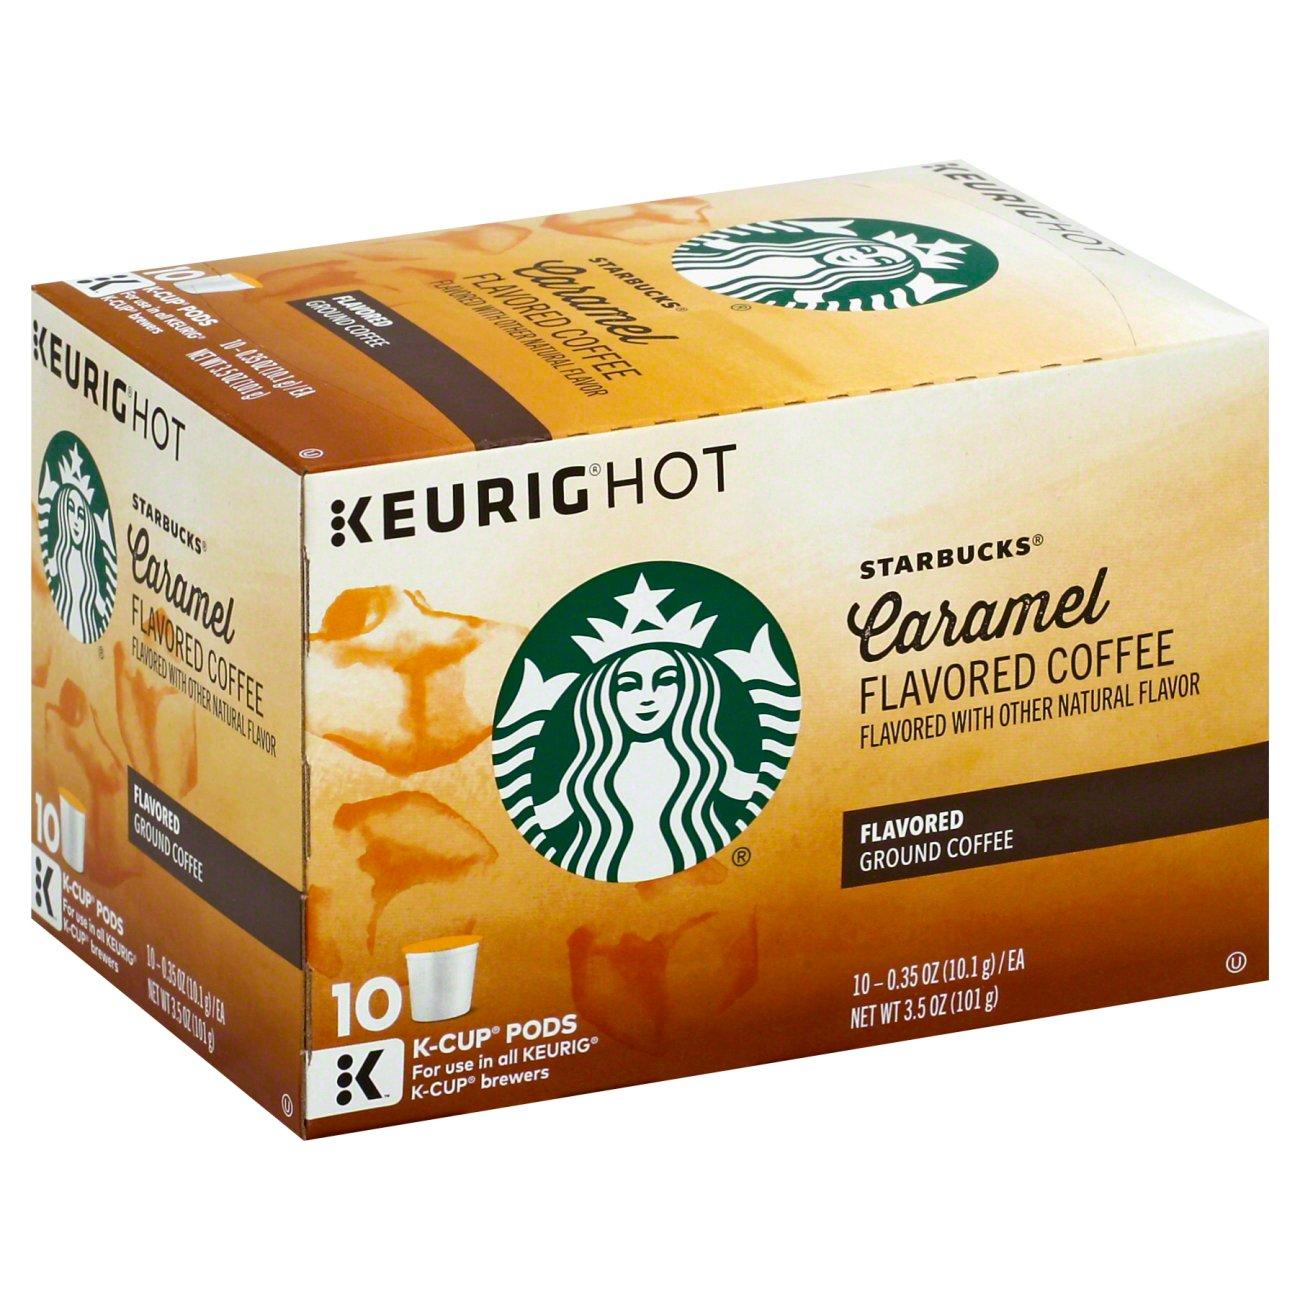 Starbucks Caramel Flavored Single Serve Coffee K Cups ‑ Shop